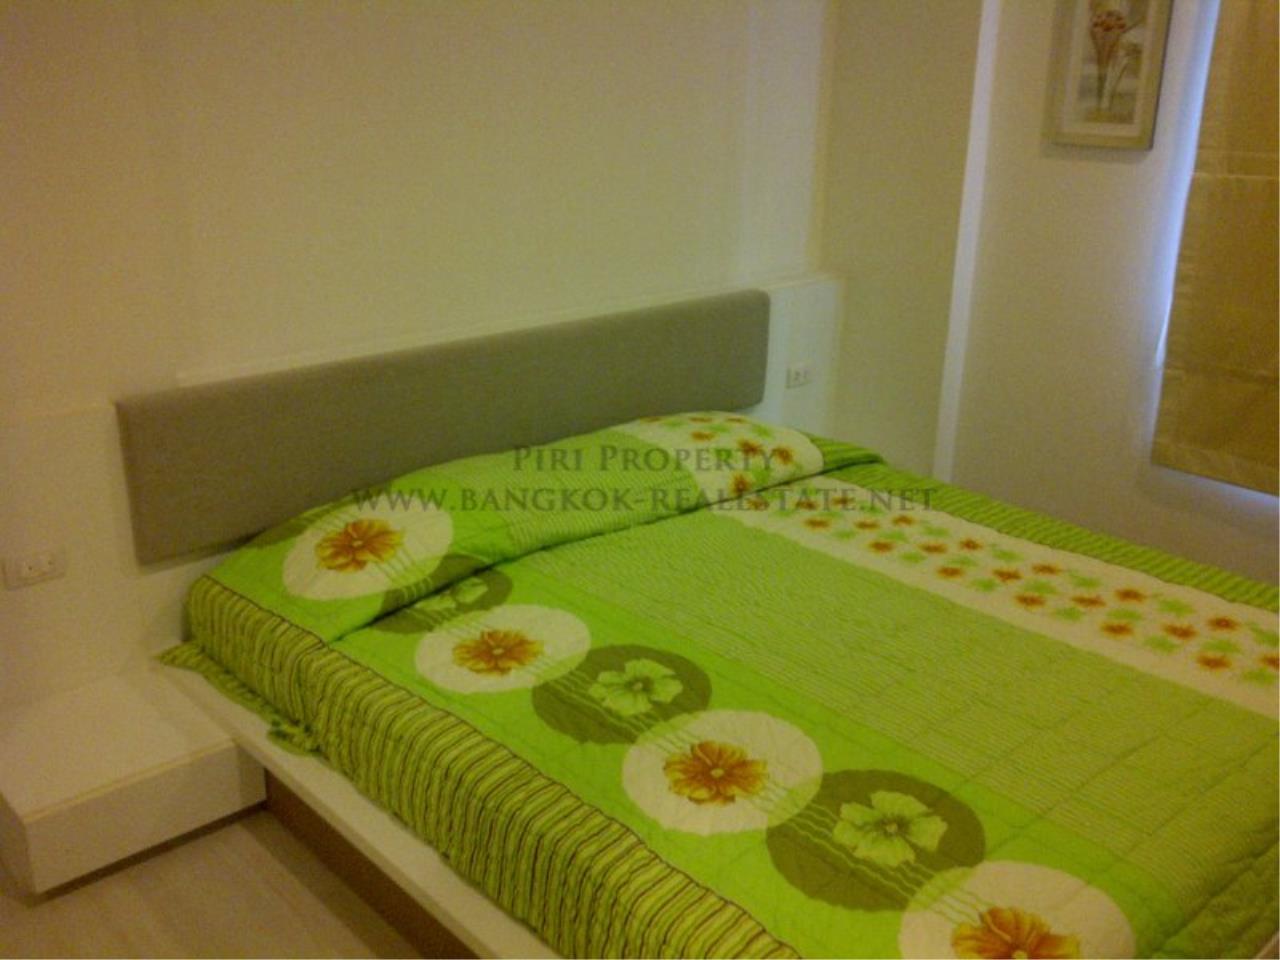 Piri Property Agency's The Room Lad Prao - 2 Bedroom on High Floor - 61SQM - 25K 3